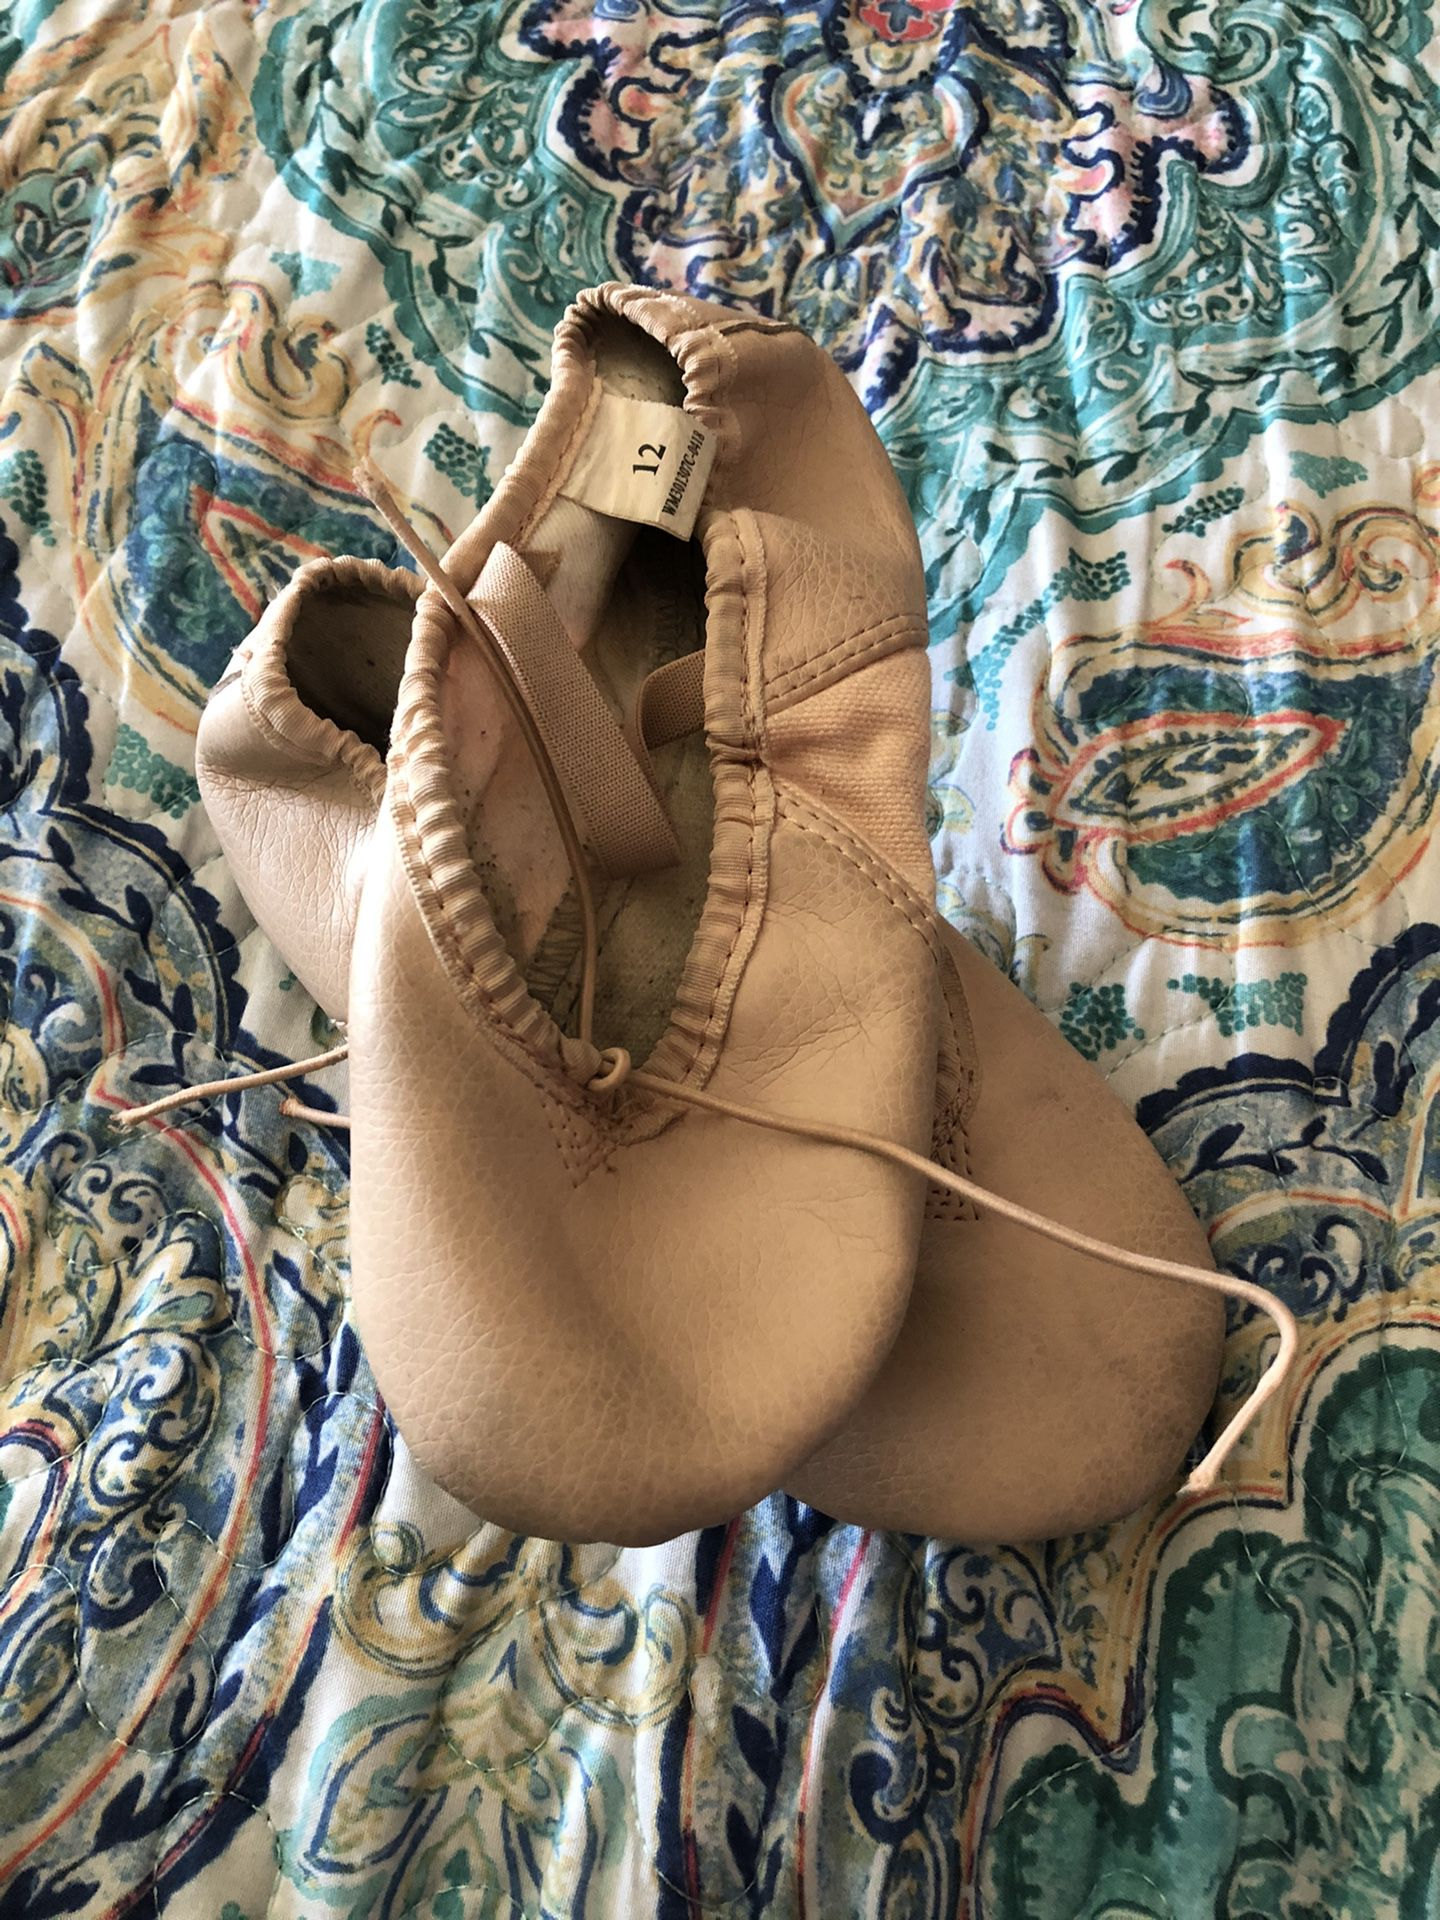 ABT American Ballet theater Brand Ballet Slippers Size 12